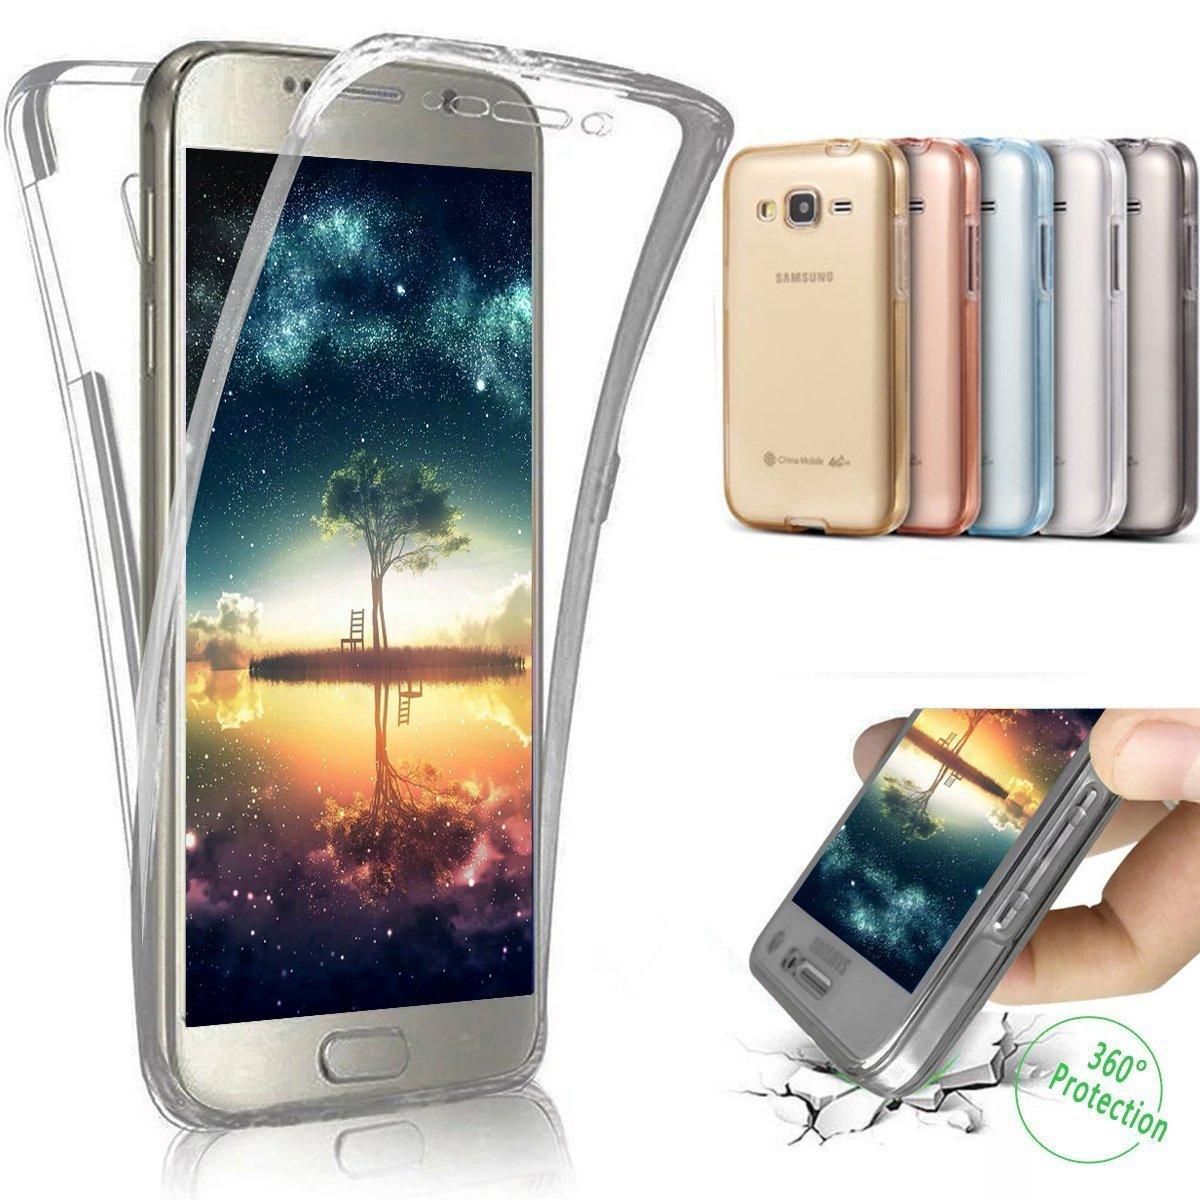 Galaxy J5funda, Samsung Galaxy J5funda, Ukayfe 360protectora ultrafina de cuerpo entero suave transparente de TPU silicona parachoques caso de goma de TPU para Samsung Galaxy J5SM-J500, Ukayfe0008931